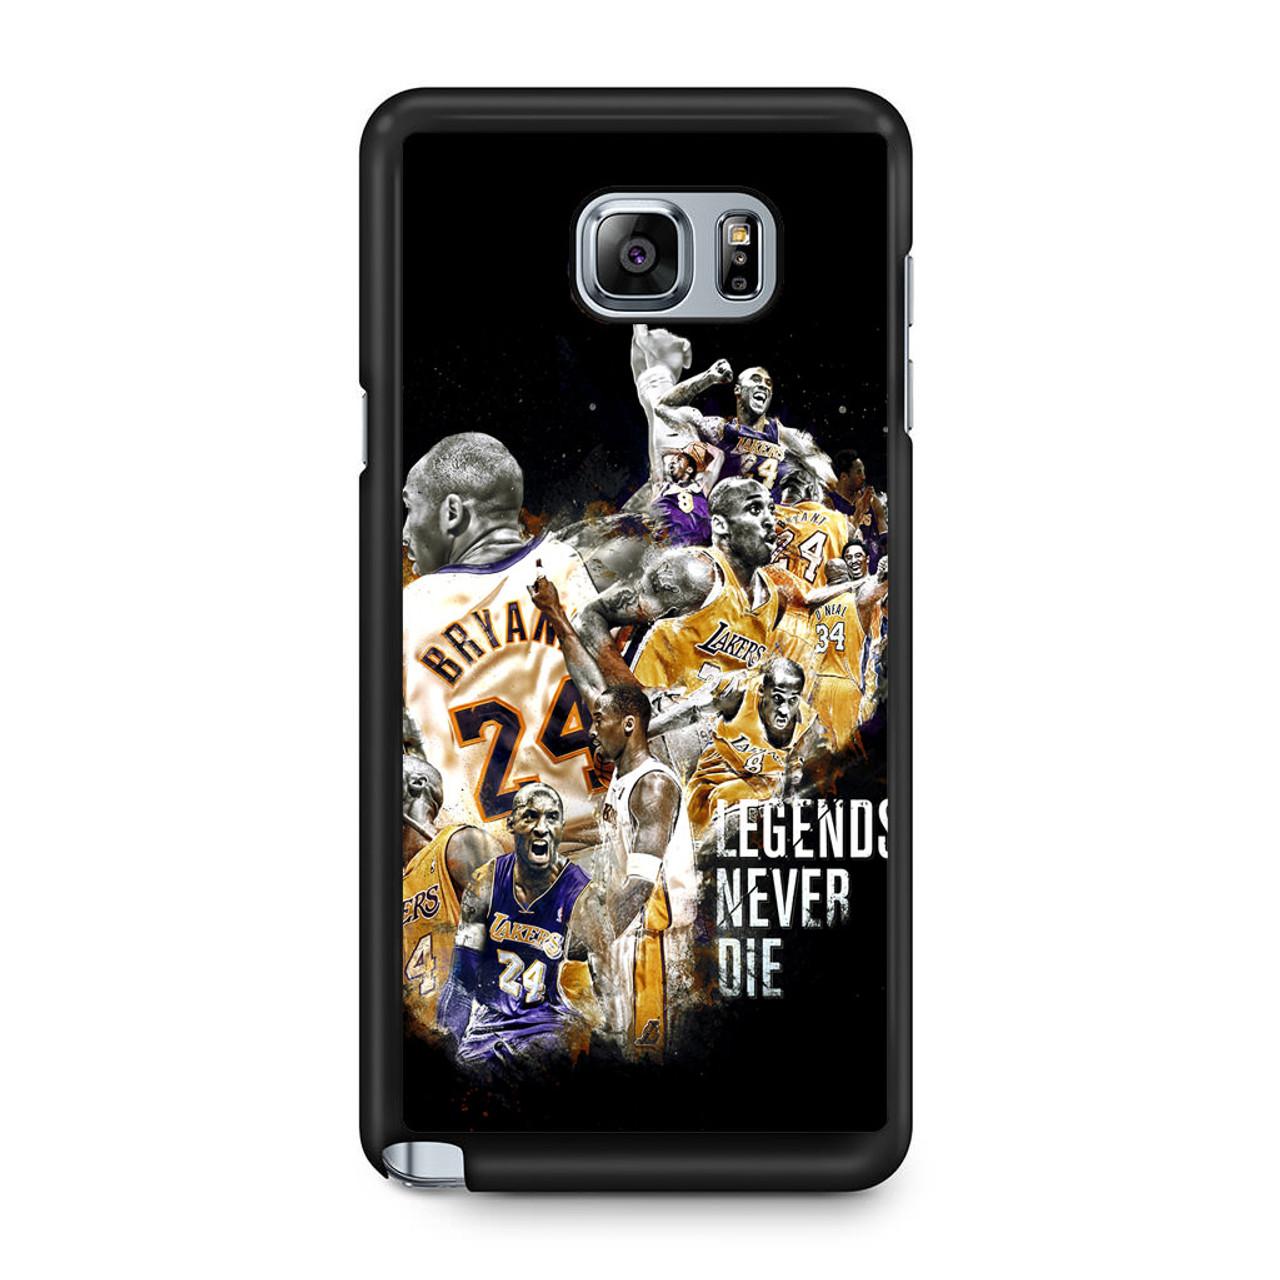 3840d9fa3db6 Kobe Bryant Legends Never Die Samsung Galaxy Note 5 Case - CASESHUNTER